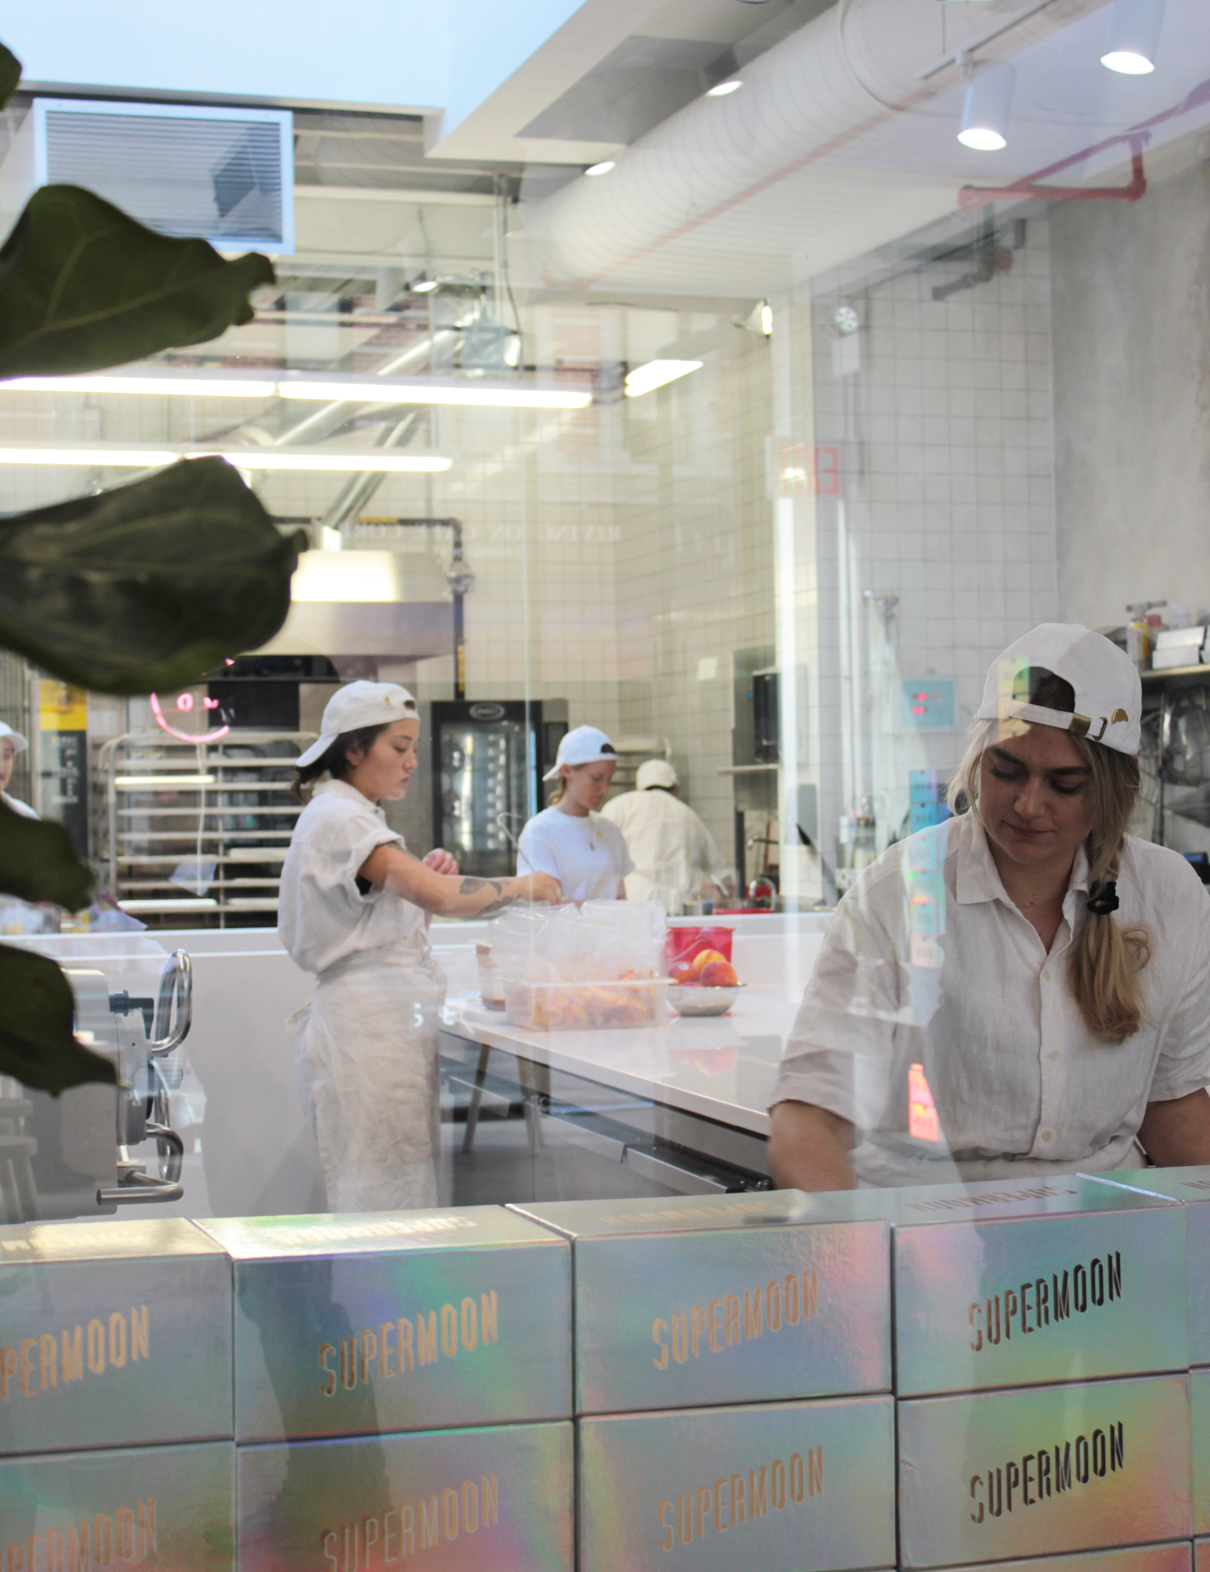 Supermoon kitchen staff wearing Dashiel Brahmann Chef shirt, Apron and Front of house uniform.